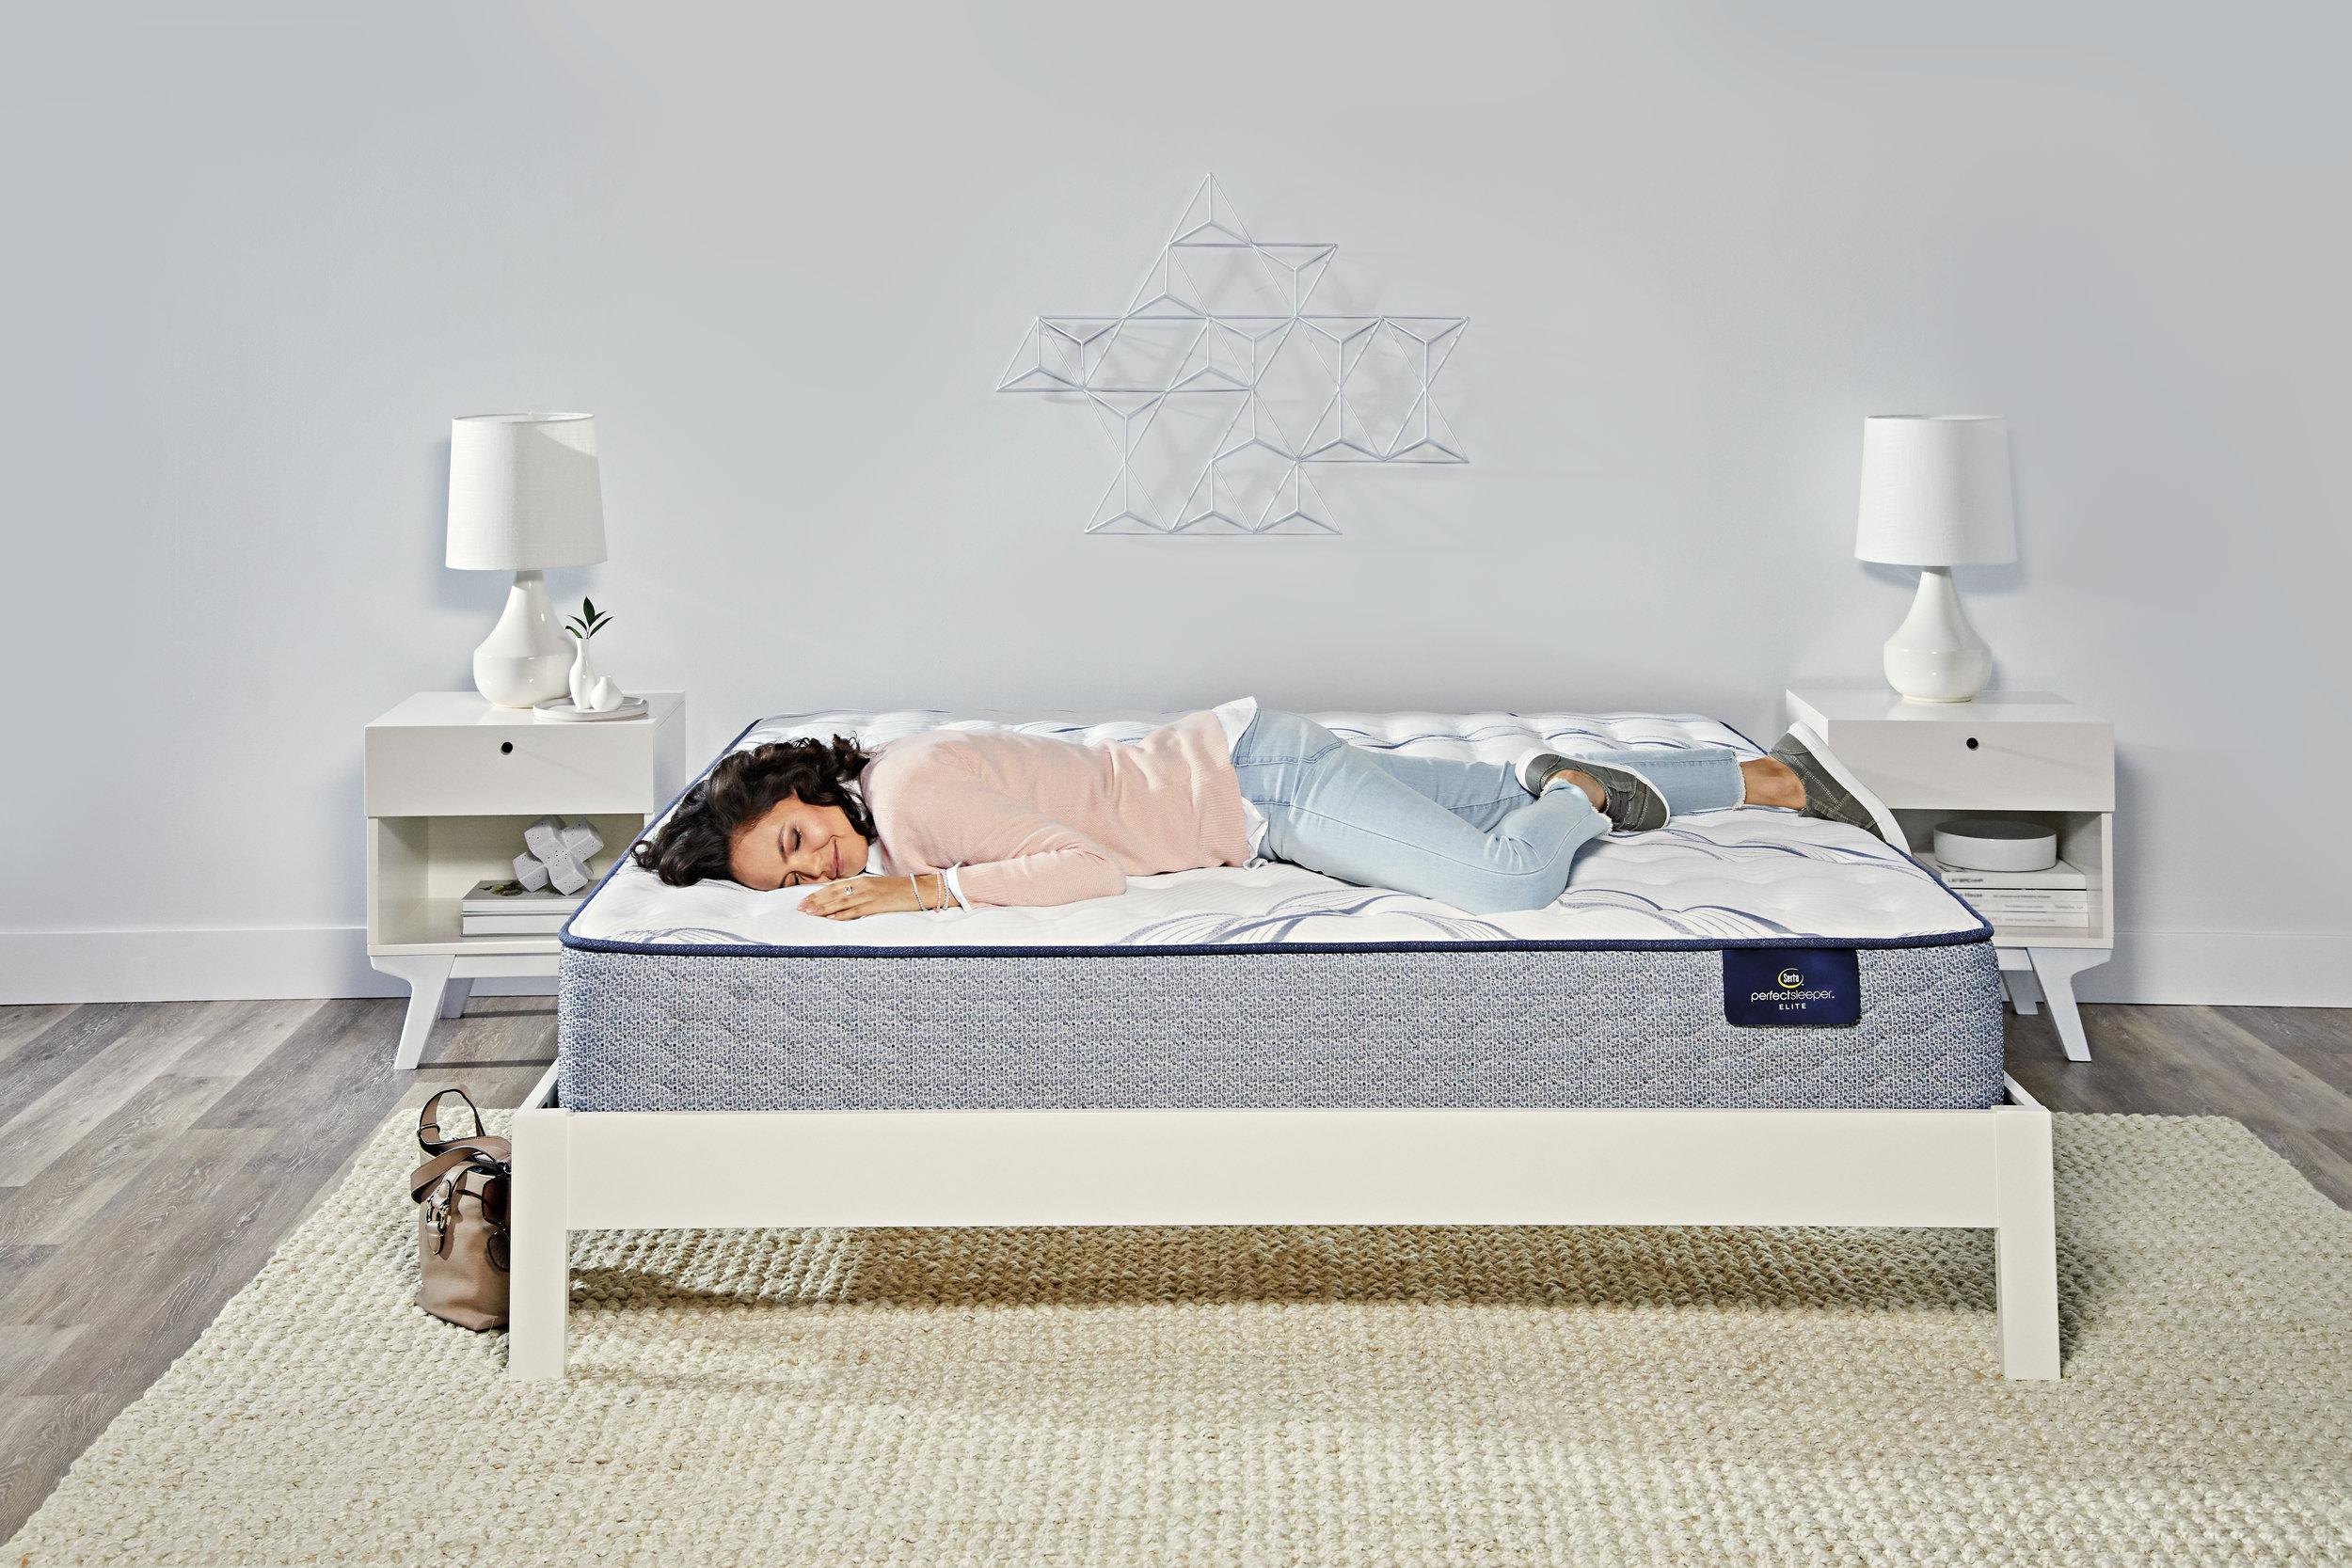 Mattress Gallery - Complete Sleep Systems